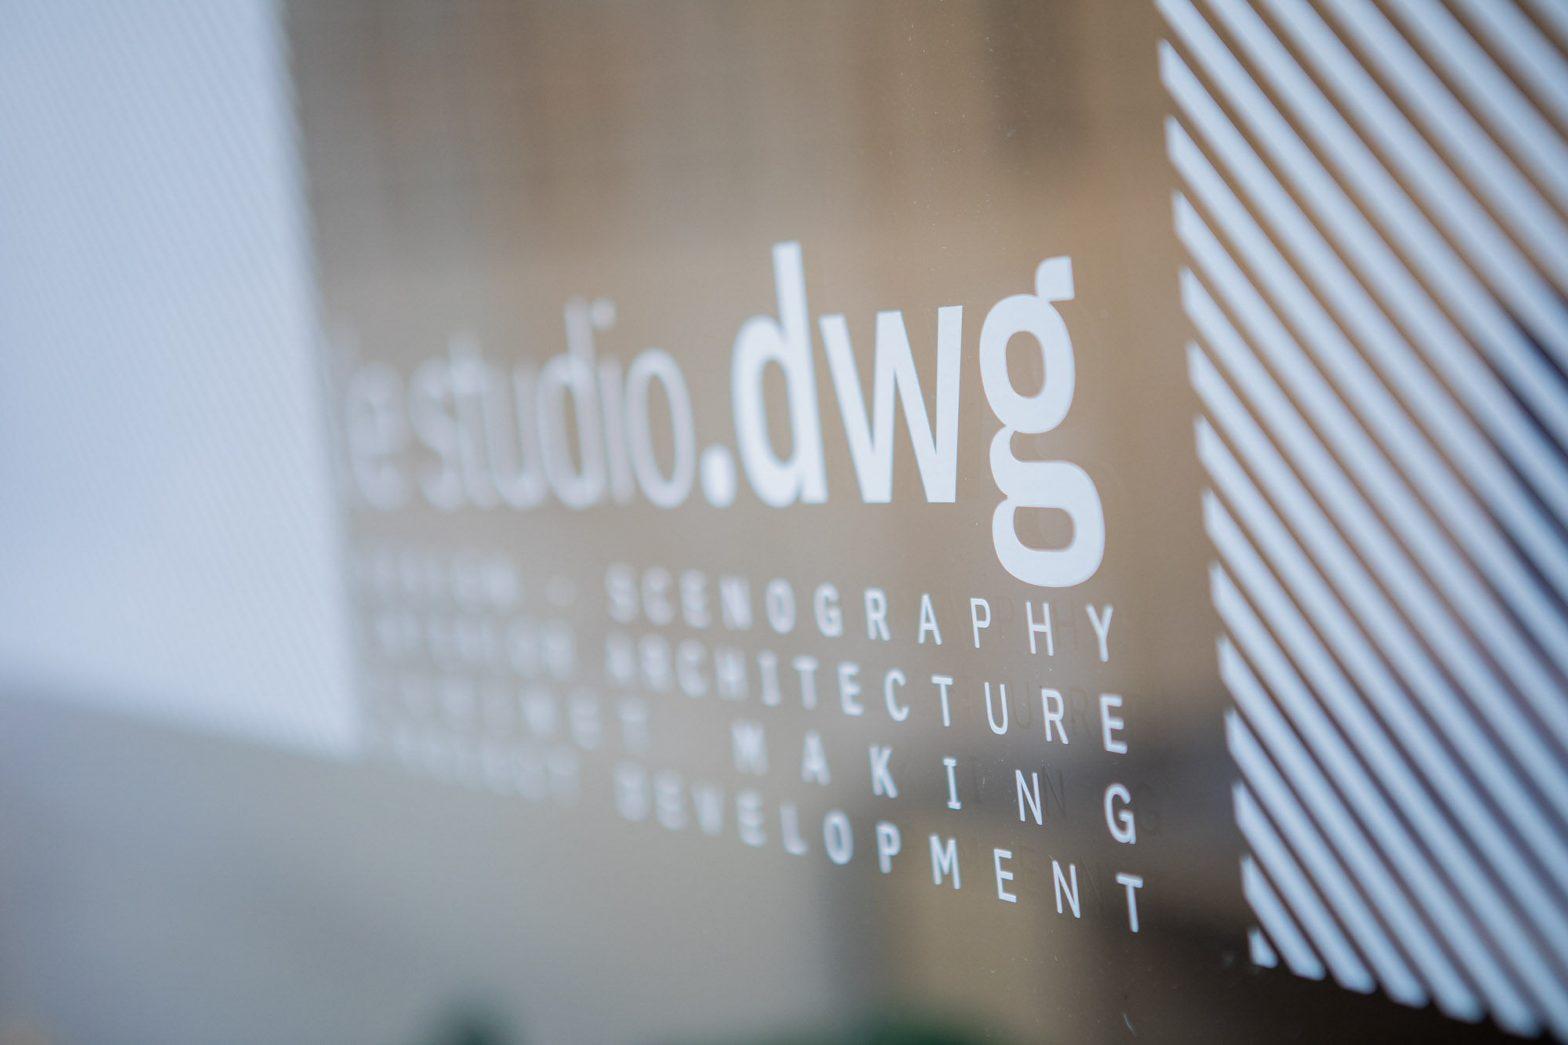 Le_studio.dwg